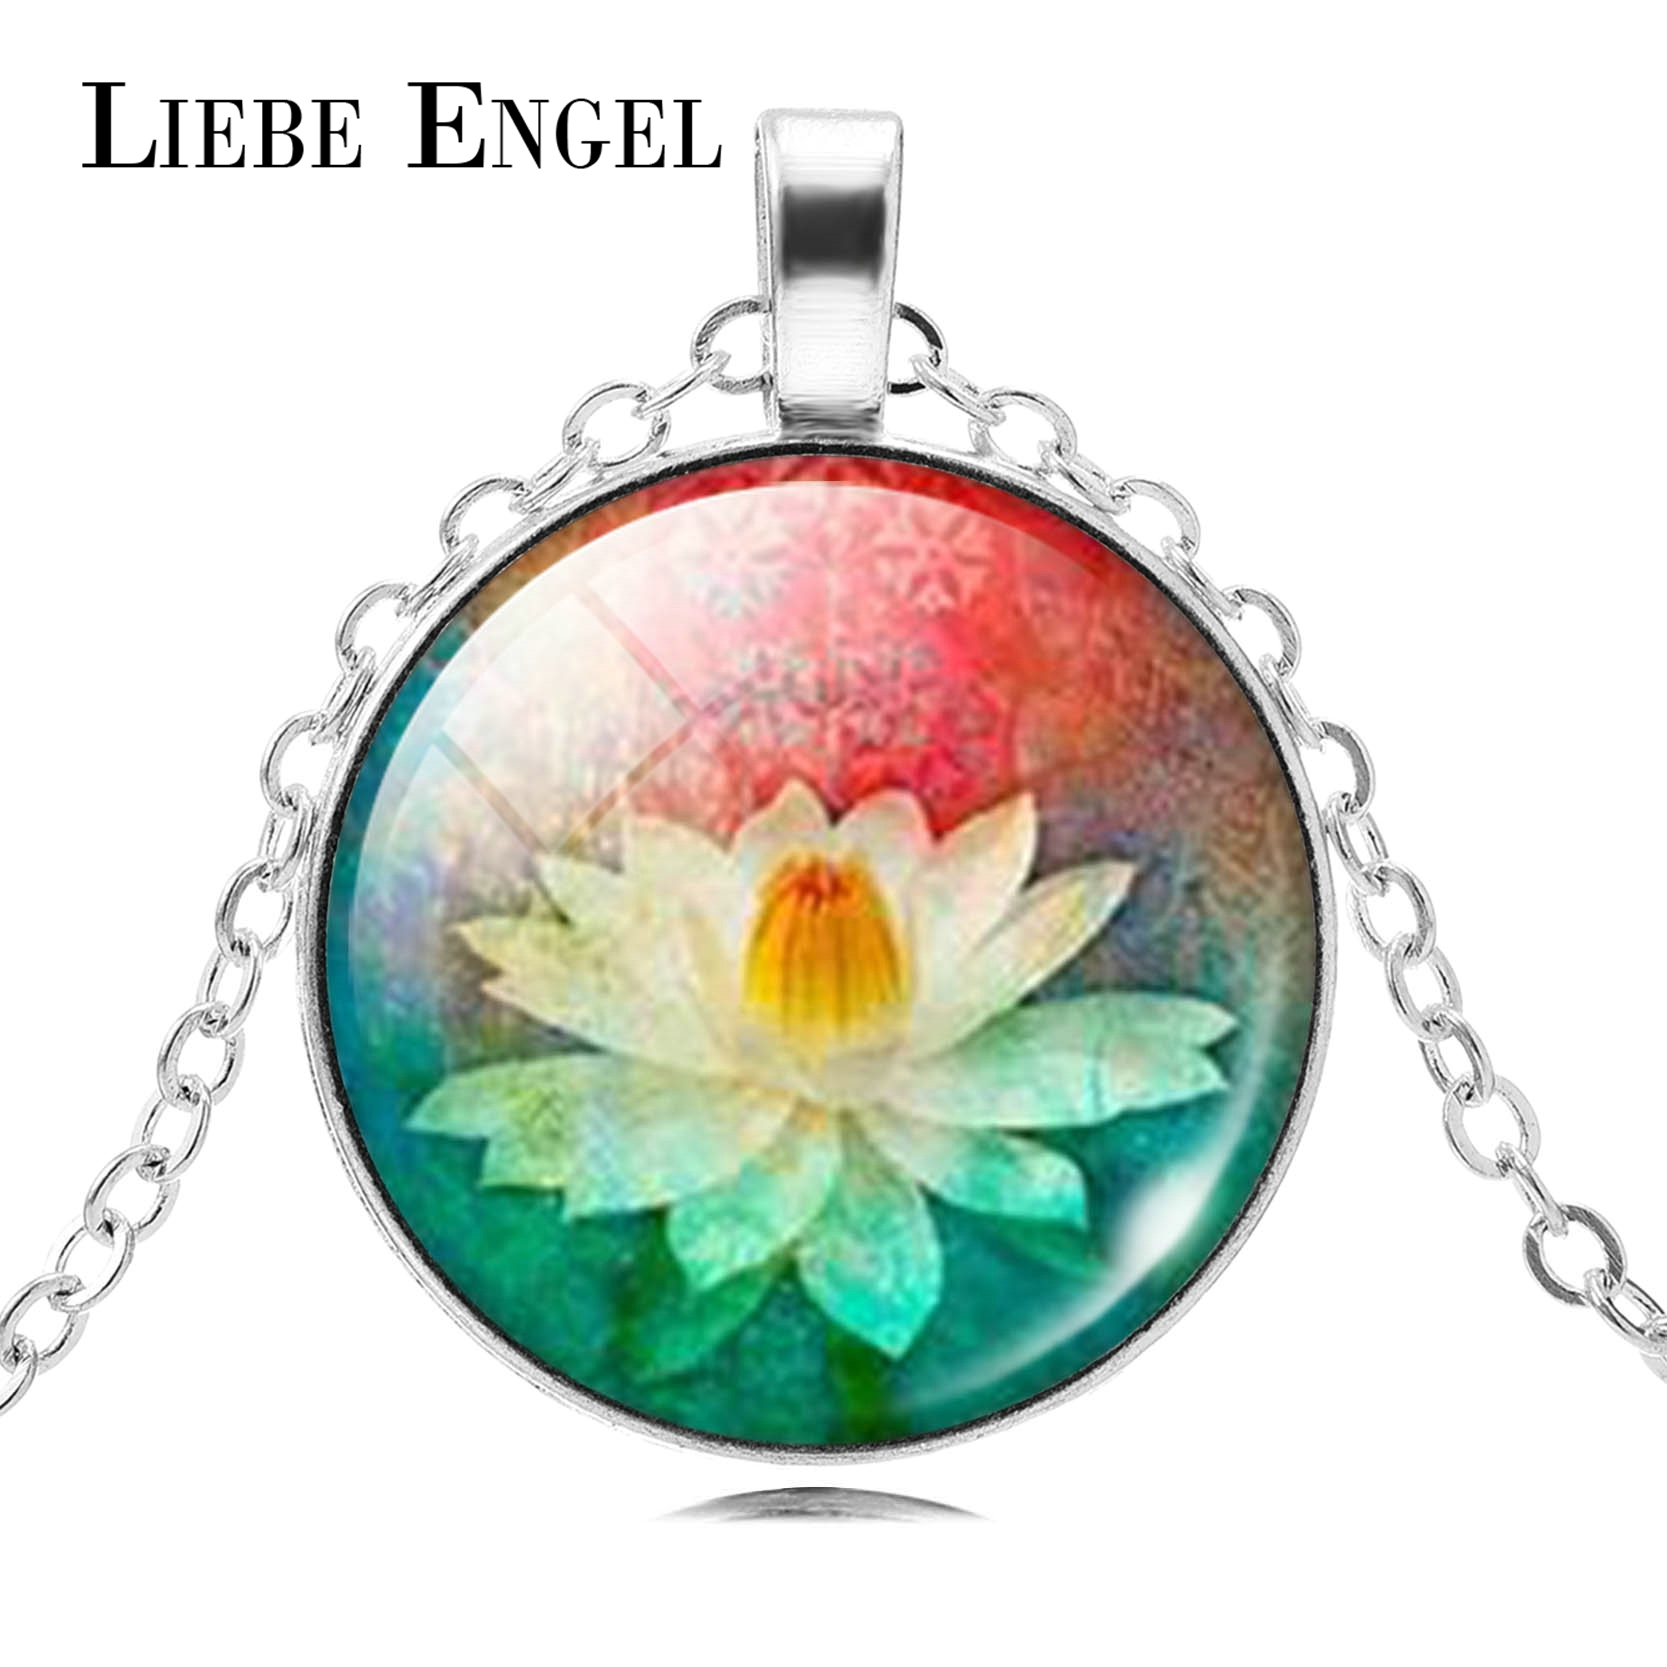 Liebe Engel Mandala Lotus Flower Necklace Pendant Om Symbol Buddhism